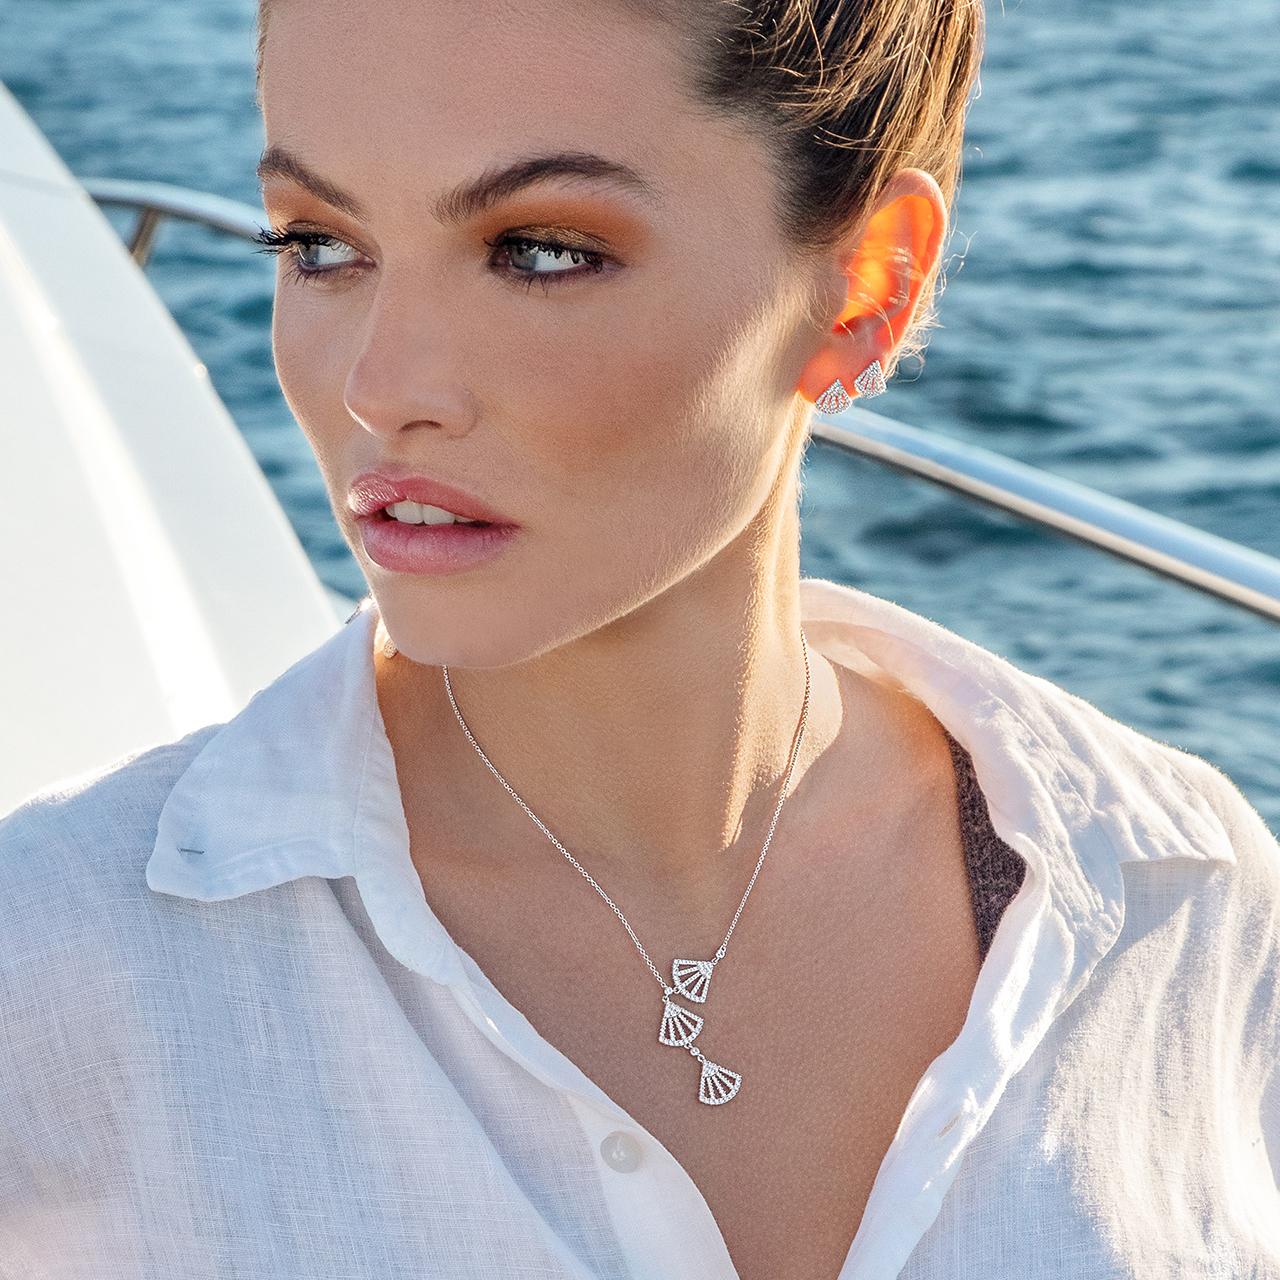 Baby  年新款潮气质轻奢高级感耳饰 2021 APM Monaco 小扇子耳钉女银